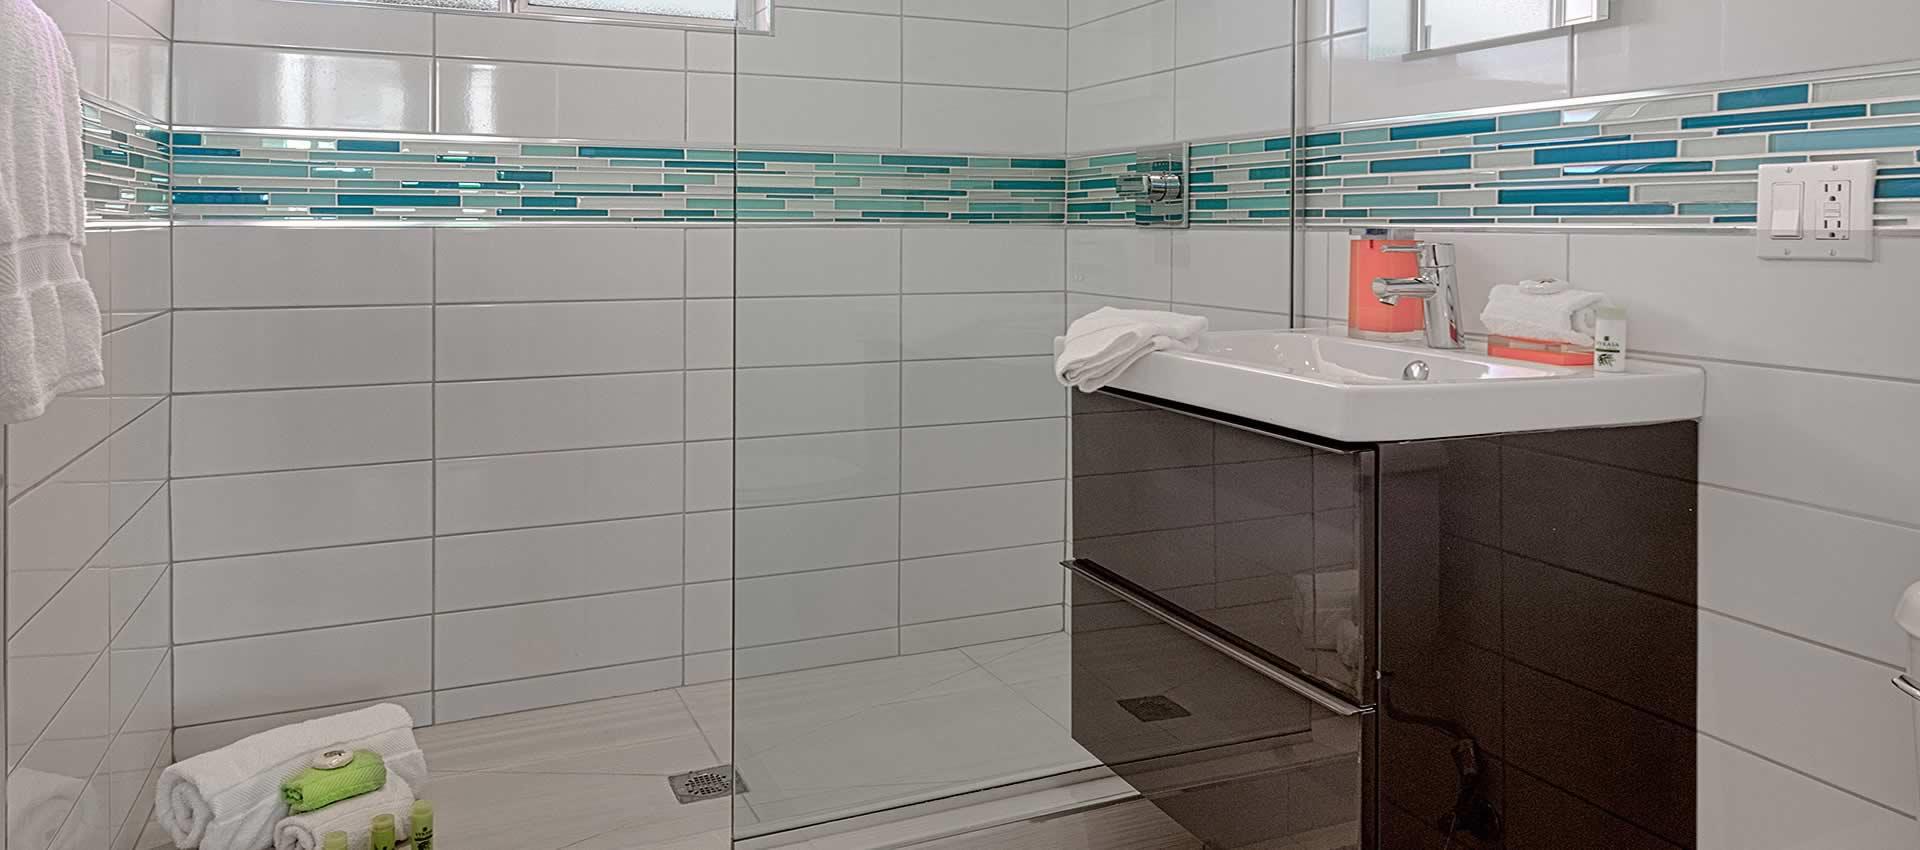 twist hotel room 217 bathroom with shower